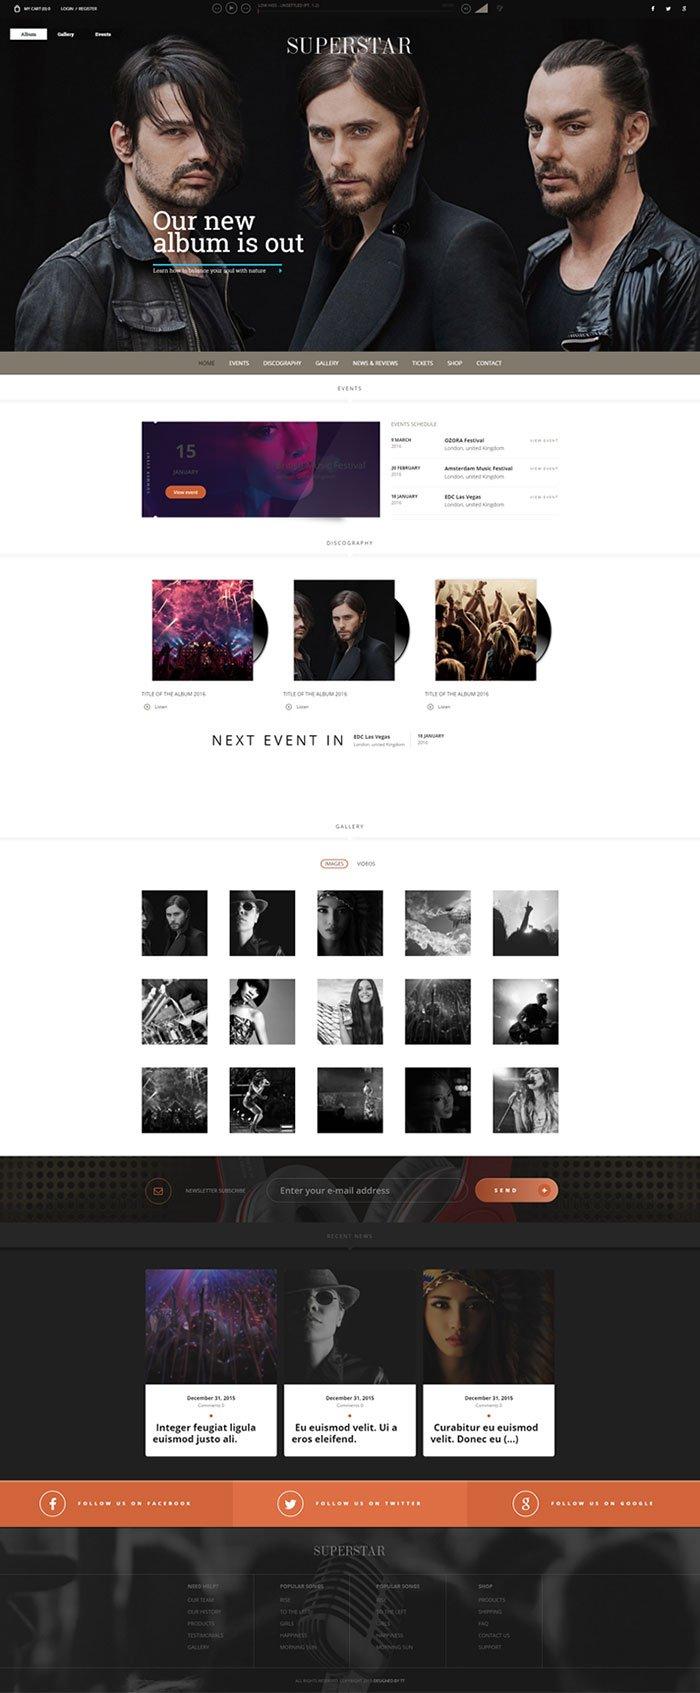 Superstar - Music Band WordPress Theme